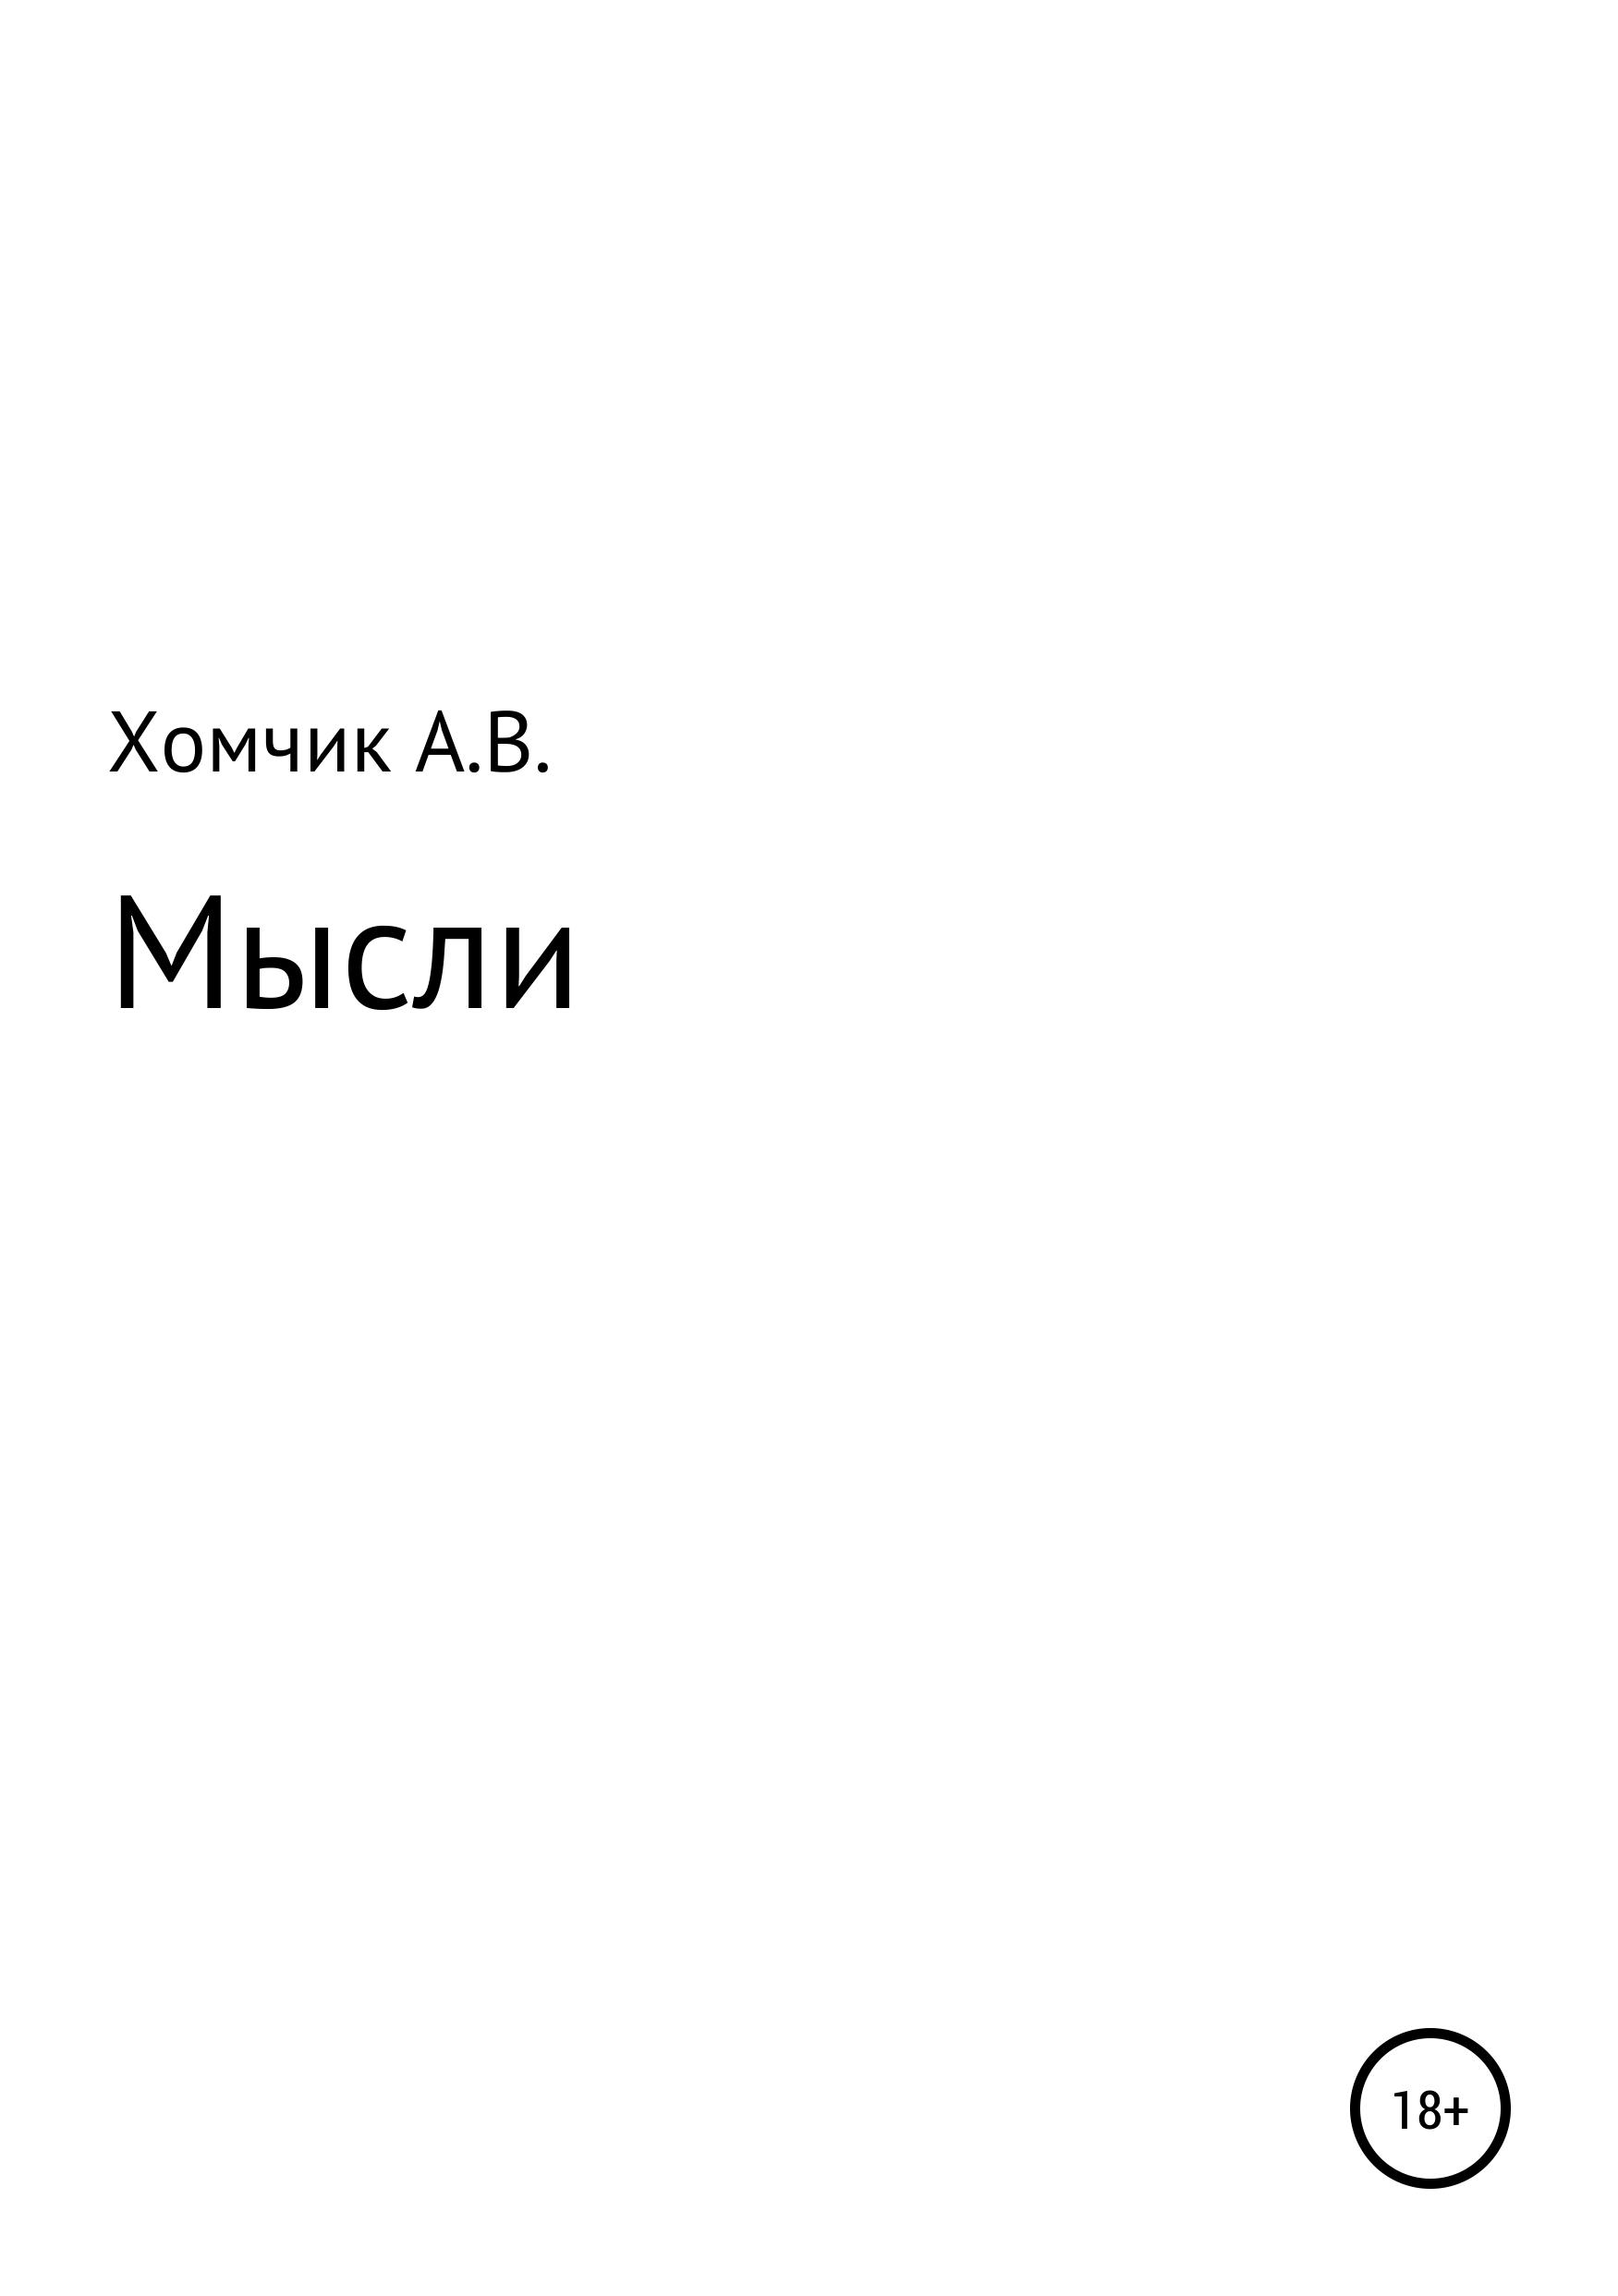 Александр Владимирович Хомчик Мысли